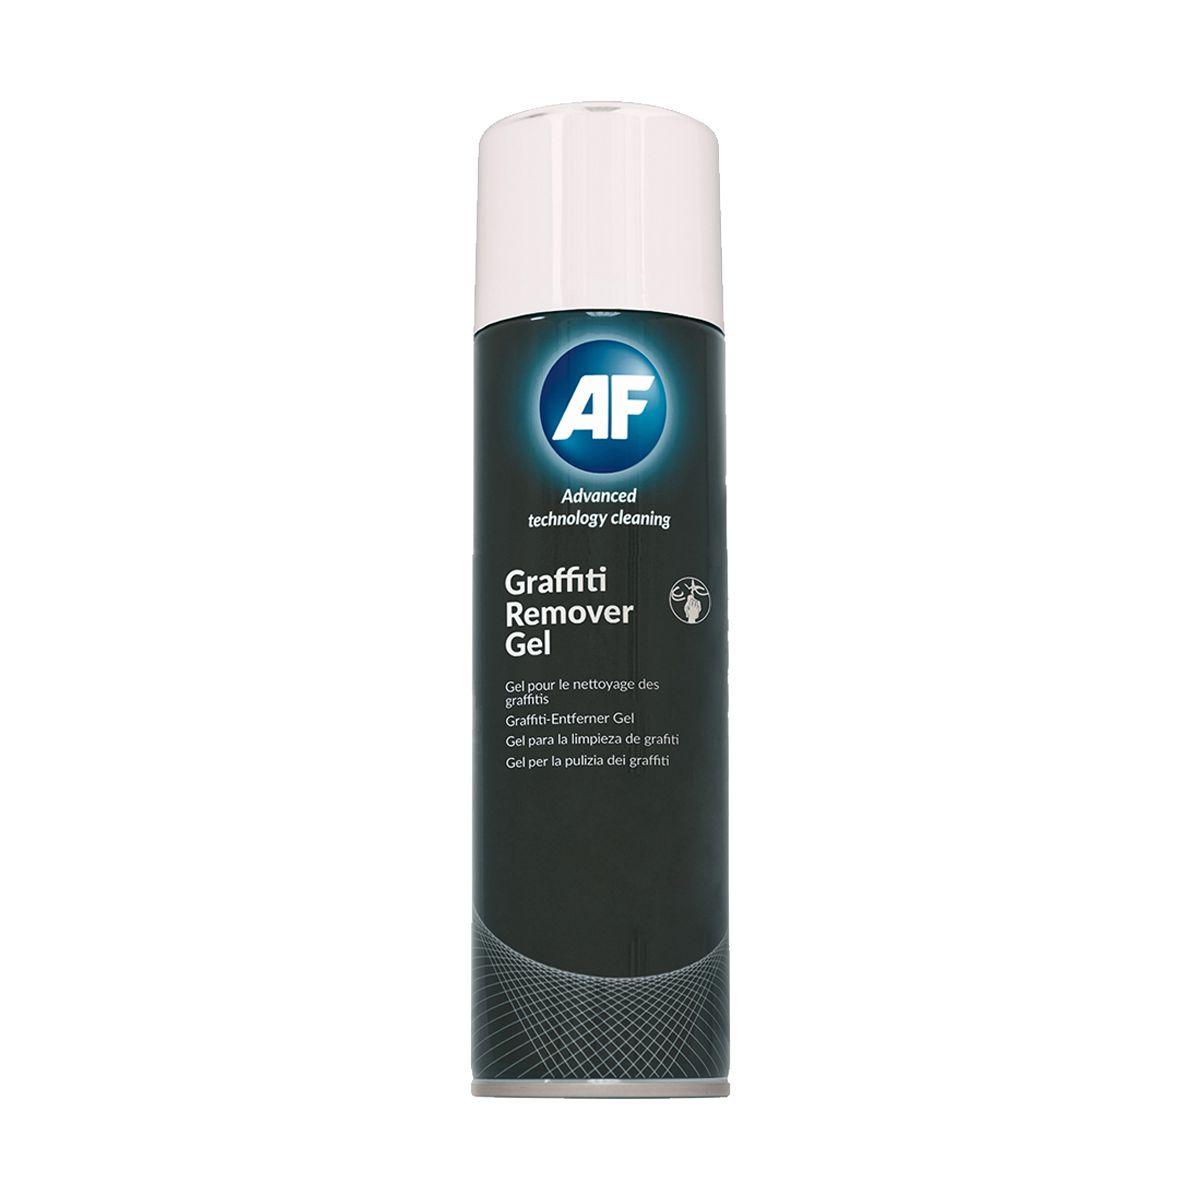 Spray removedor de graffiti AF Graffiti Remover Gel 400ml